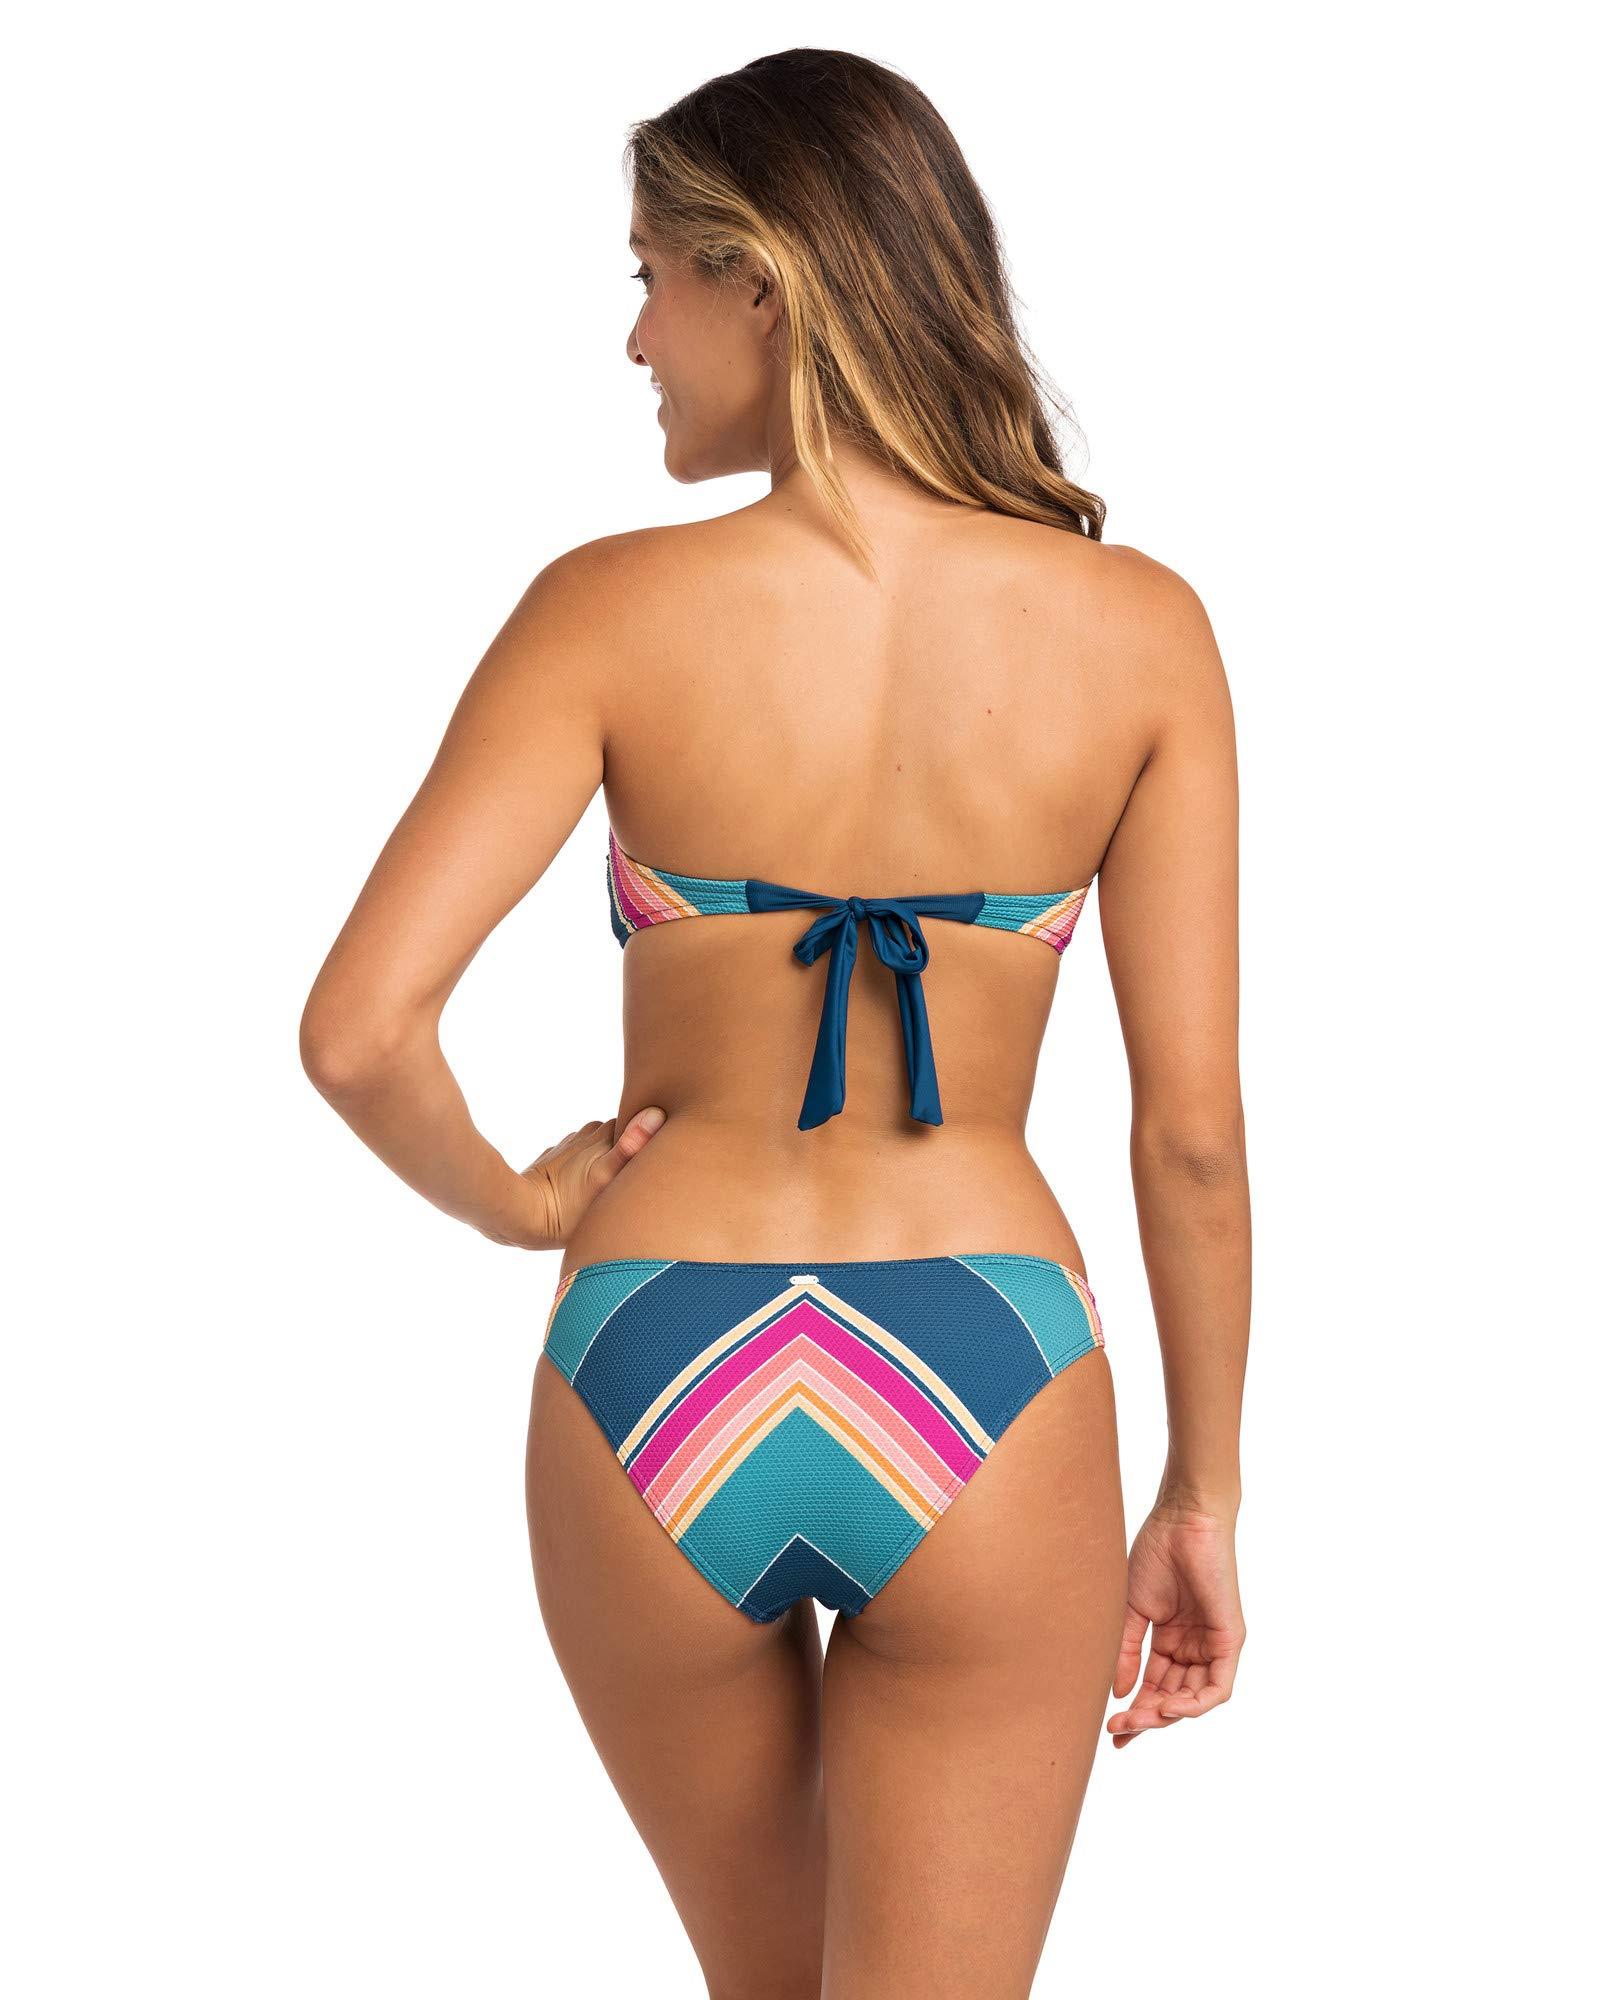 RIP CURL Golden Haze Bikini Top,Pantalones,Set,Bikini de Surf